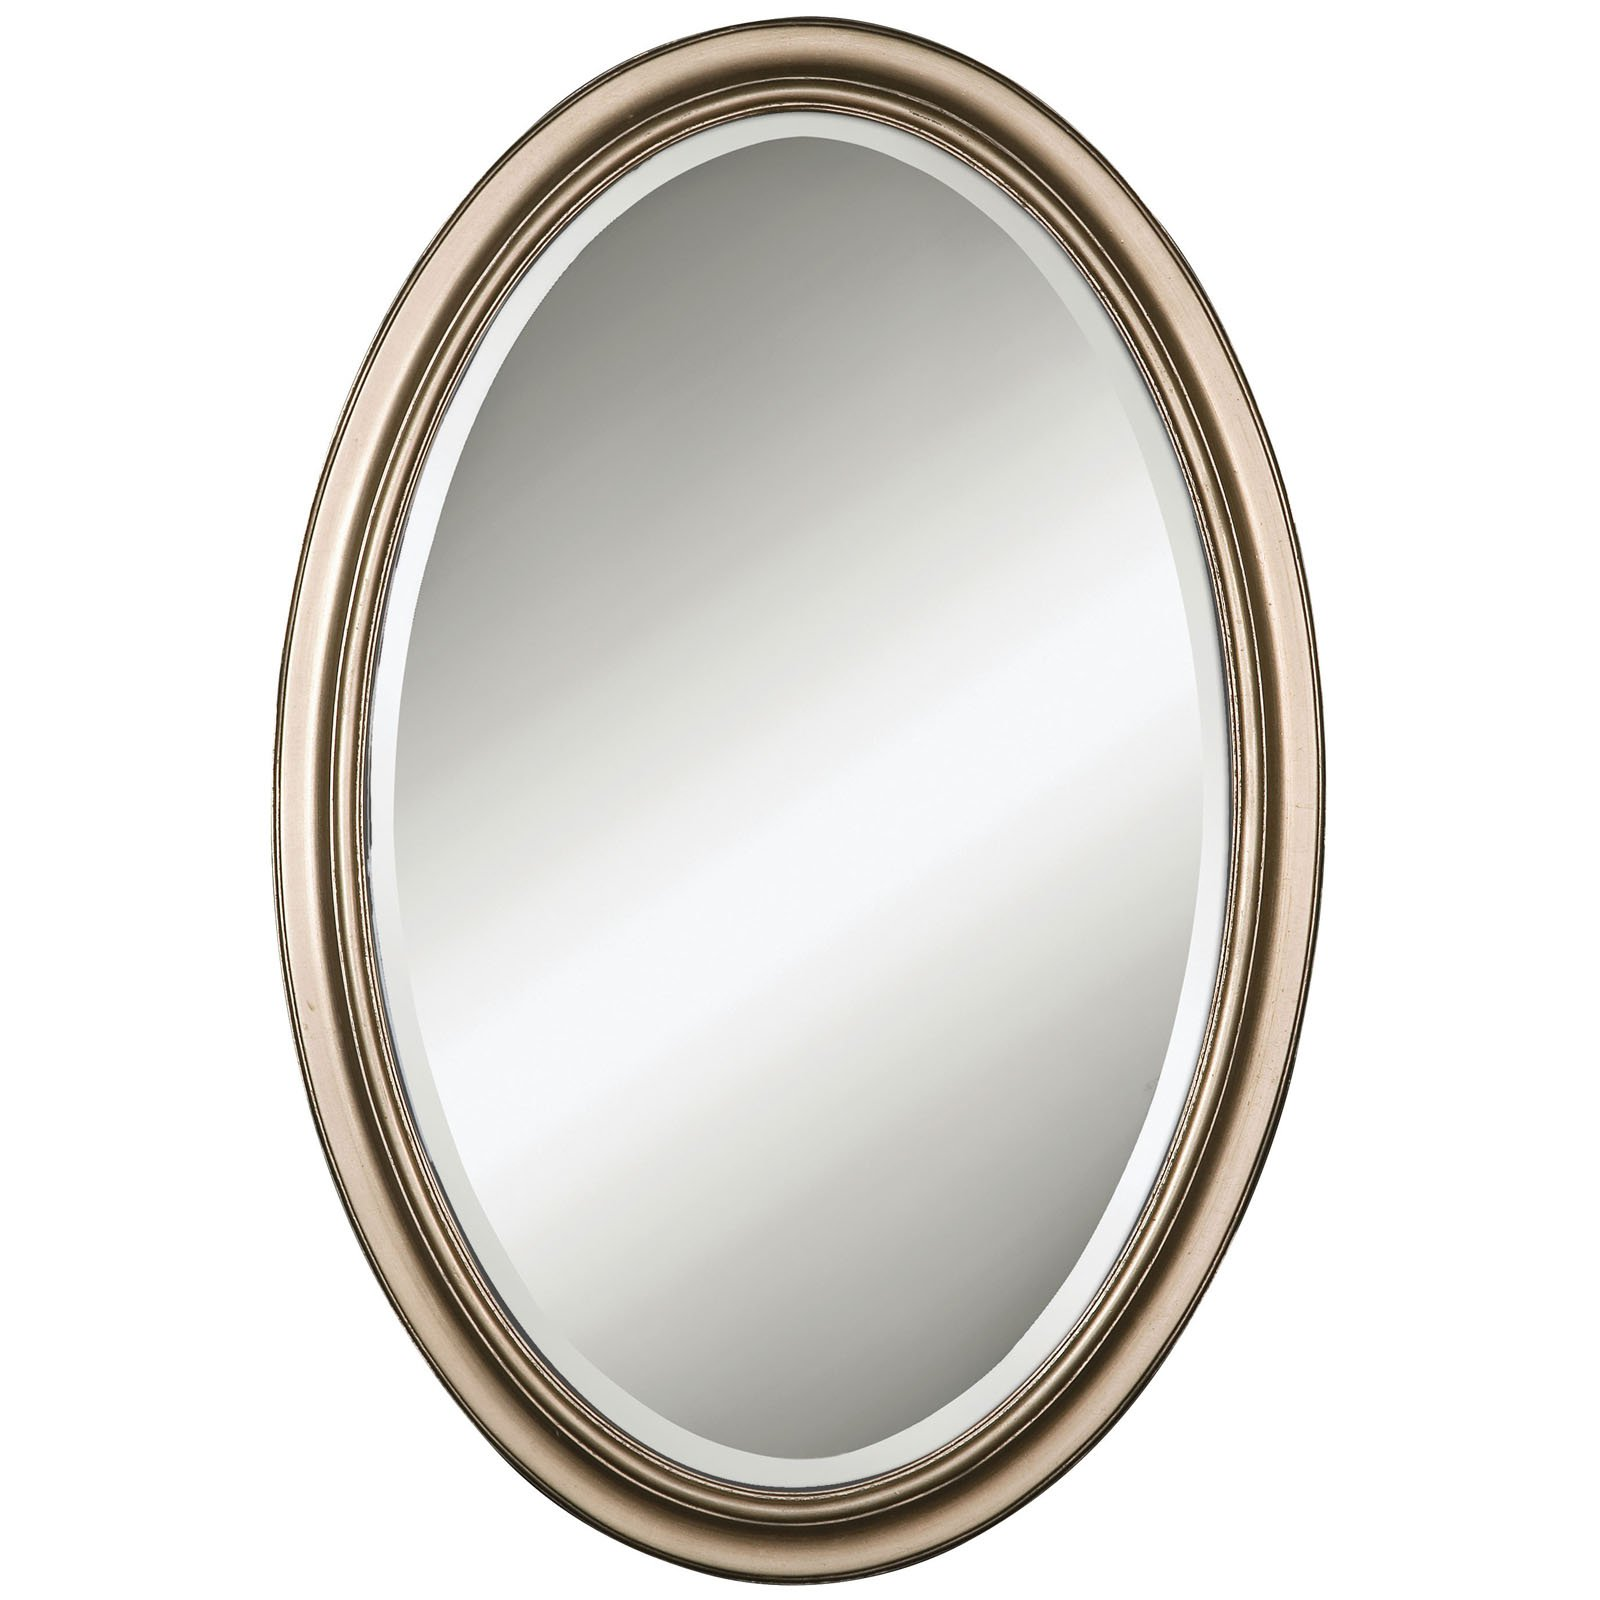 Uttermost Petite Manhattan Oval Silver Wall Mirror - 21W x 31H in.